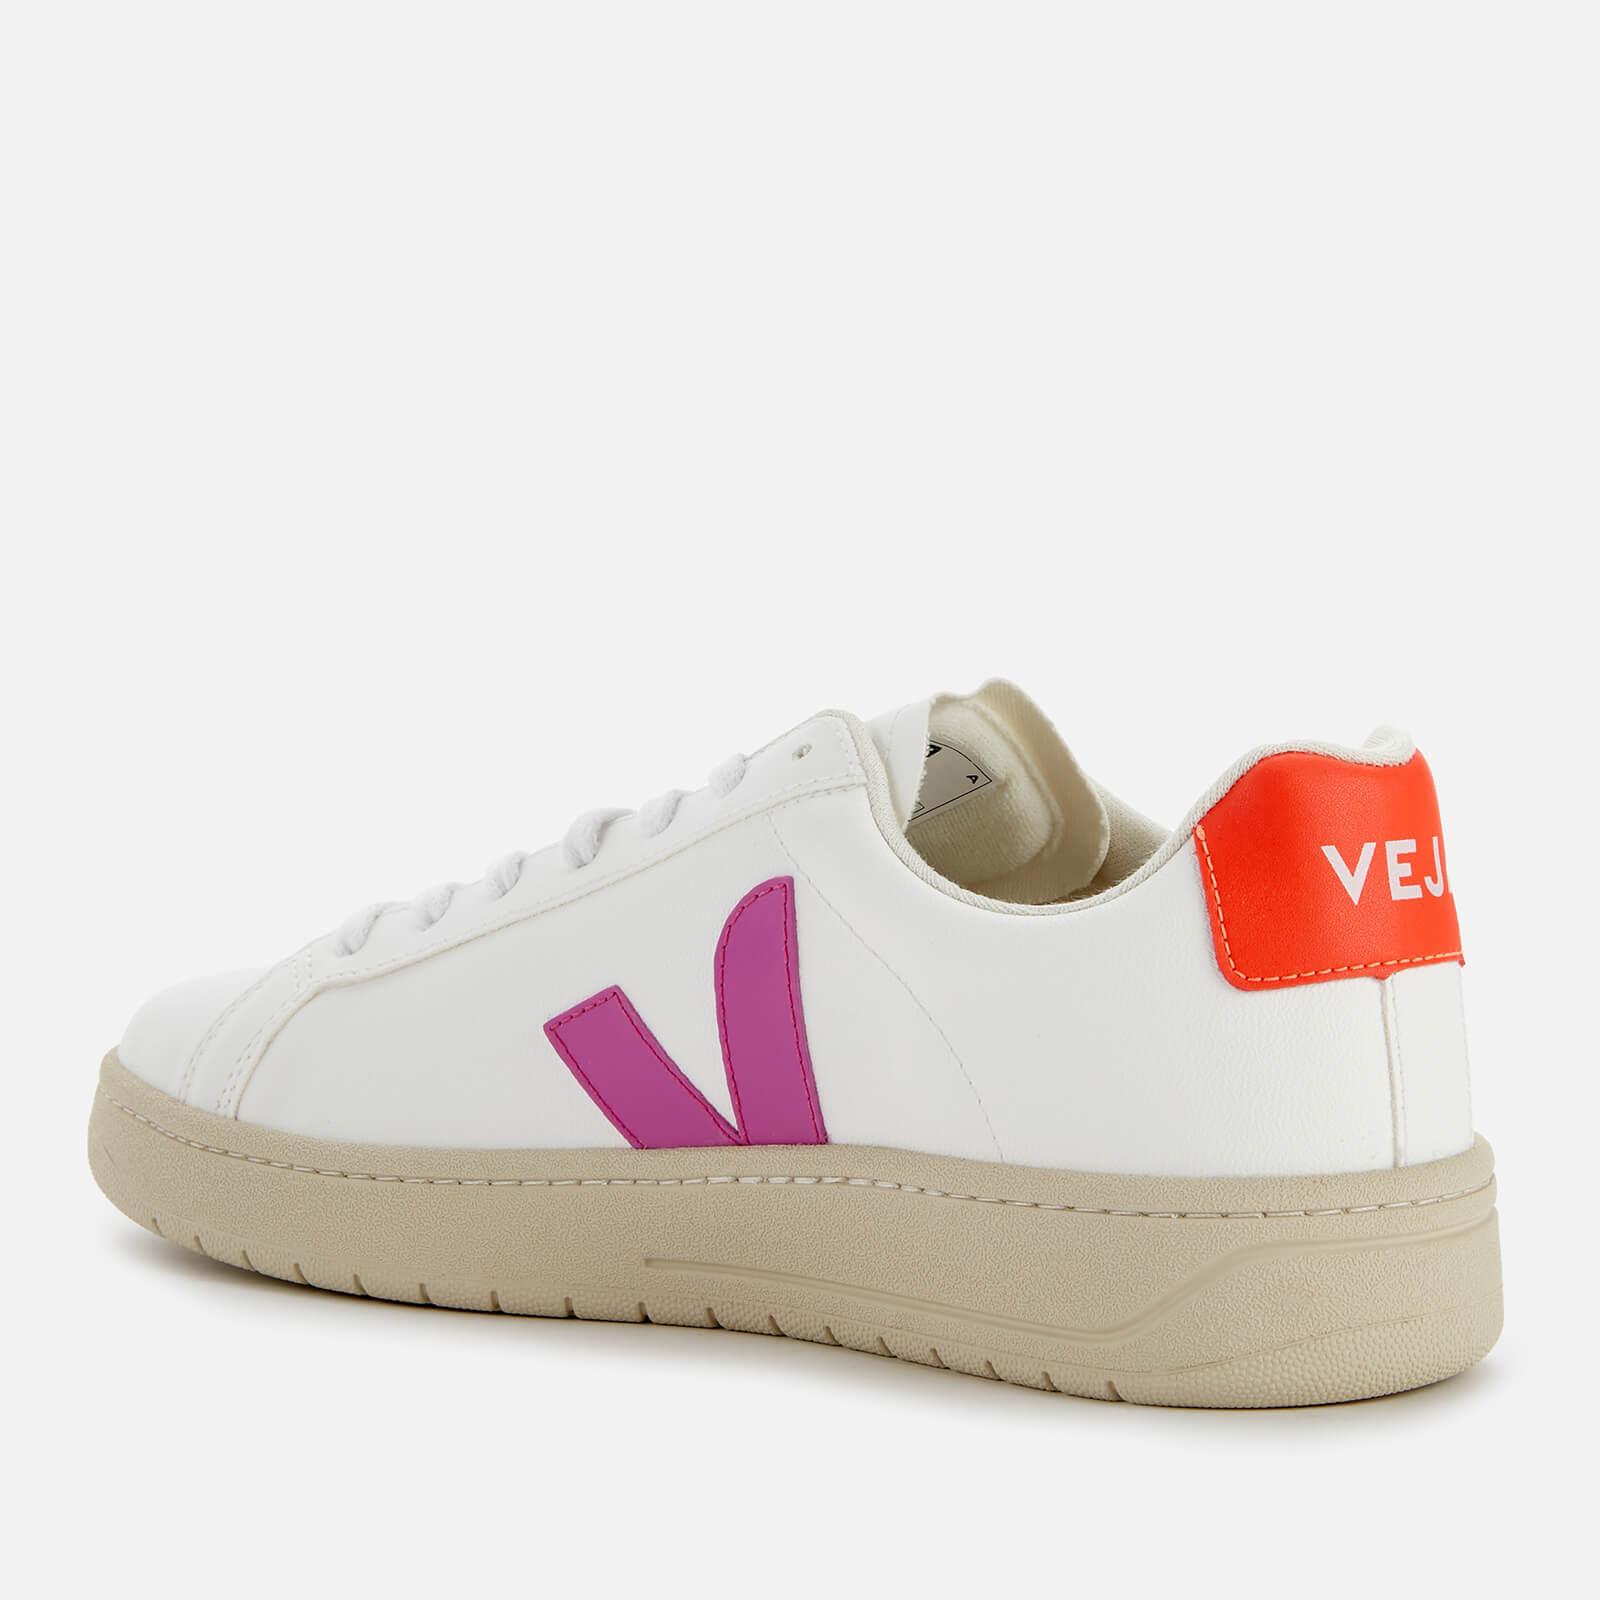 Veja Women's Urca Vegan Trainers - White/Ultraviolet/Orange Fluo